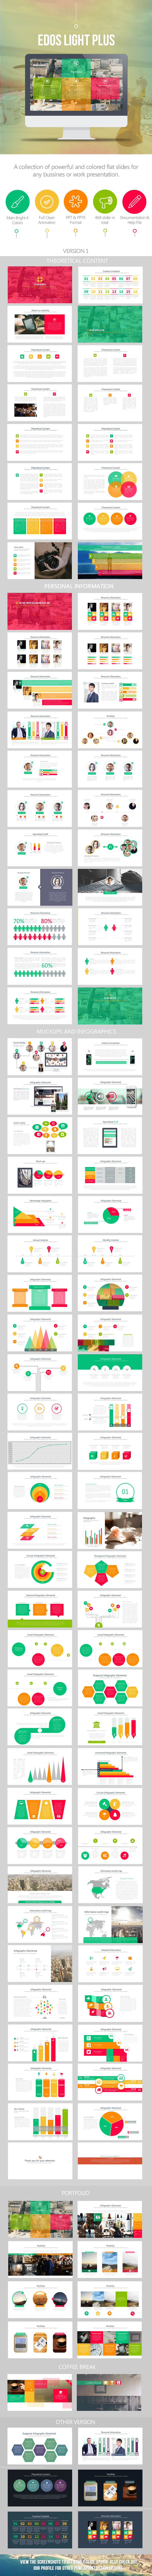 Edos Light Plus - PowerPoint Templates Presentation Templates